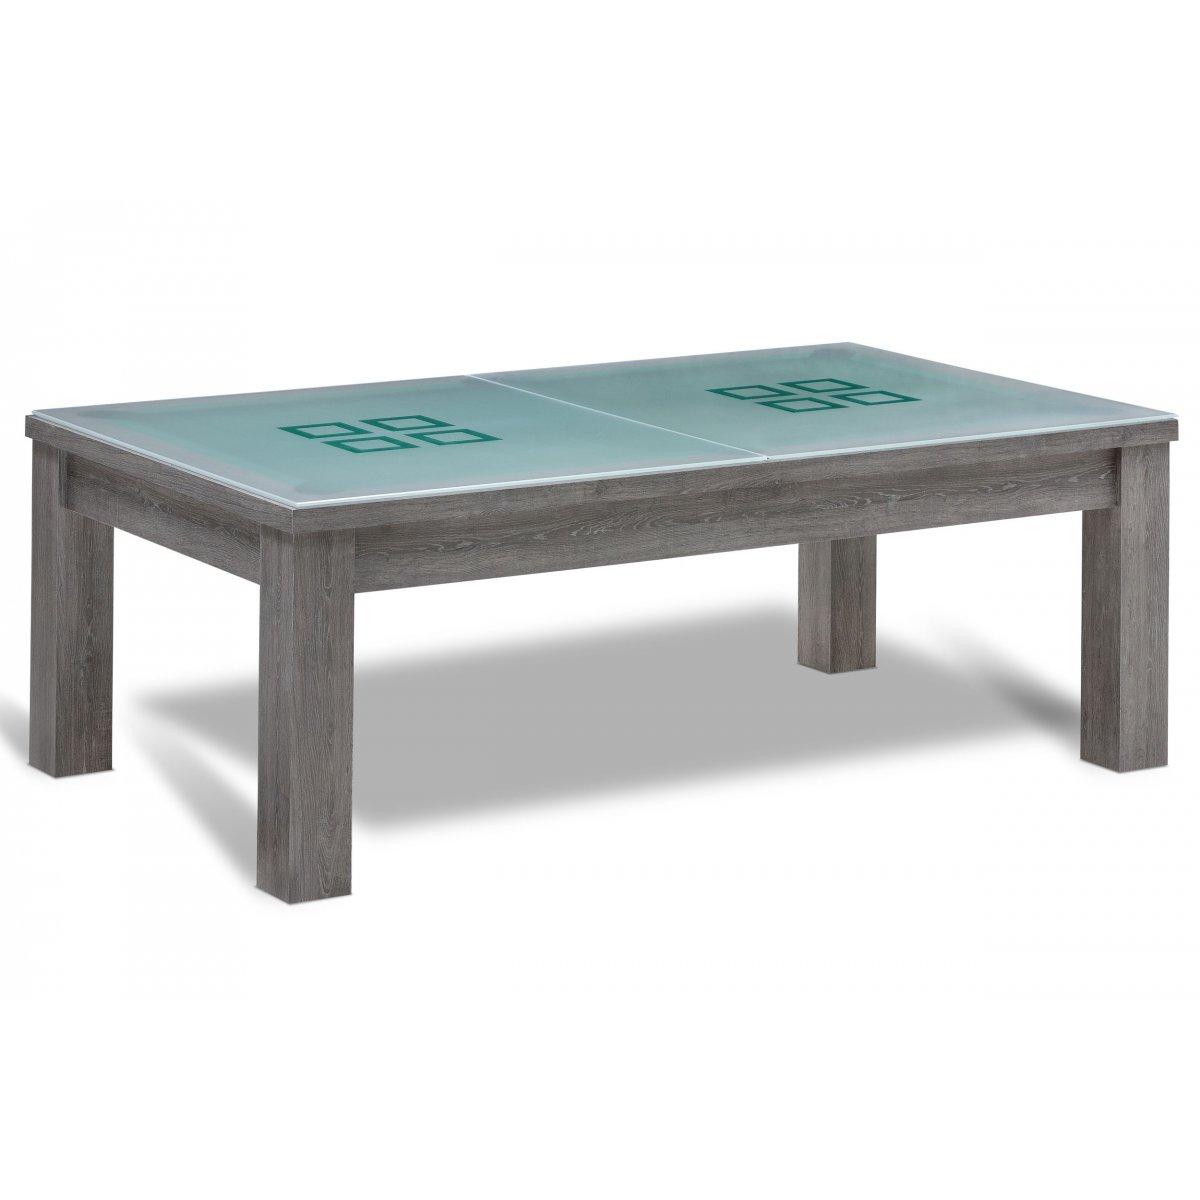 billard am ricain table de jeu de billard us convertible. Black Bedroom Furniture Sets. Home Design Ideas